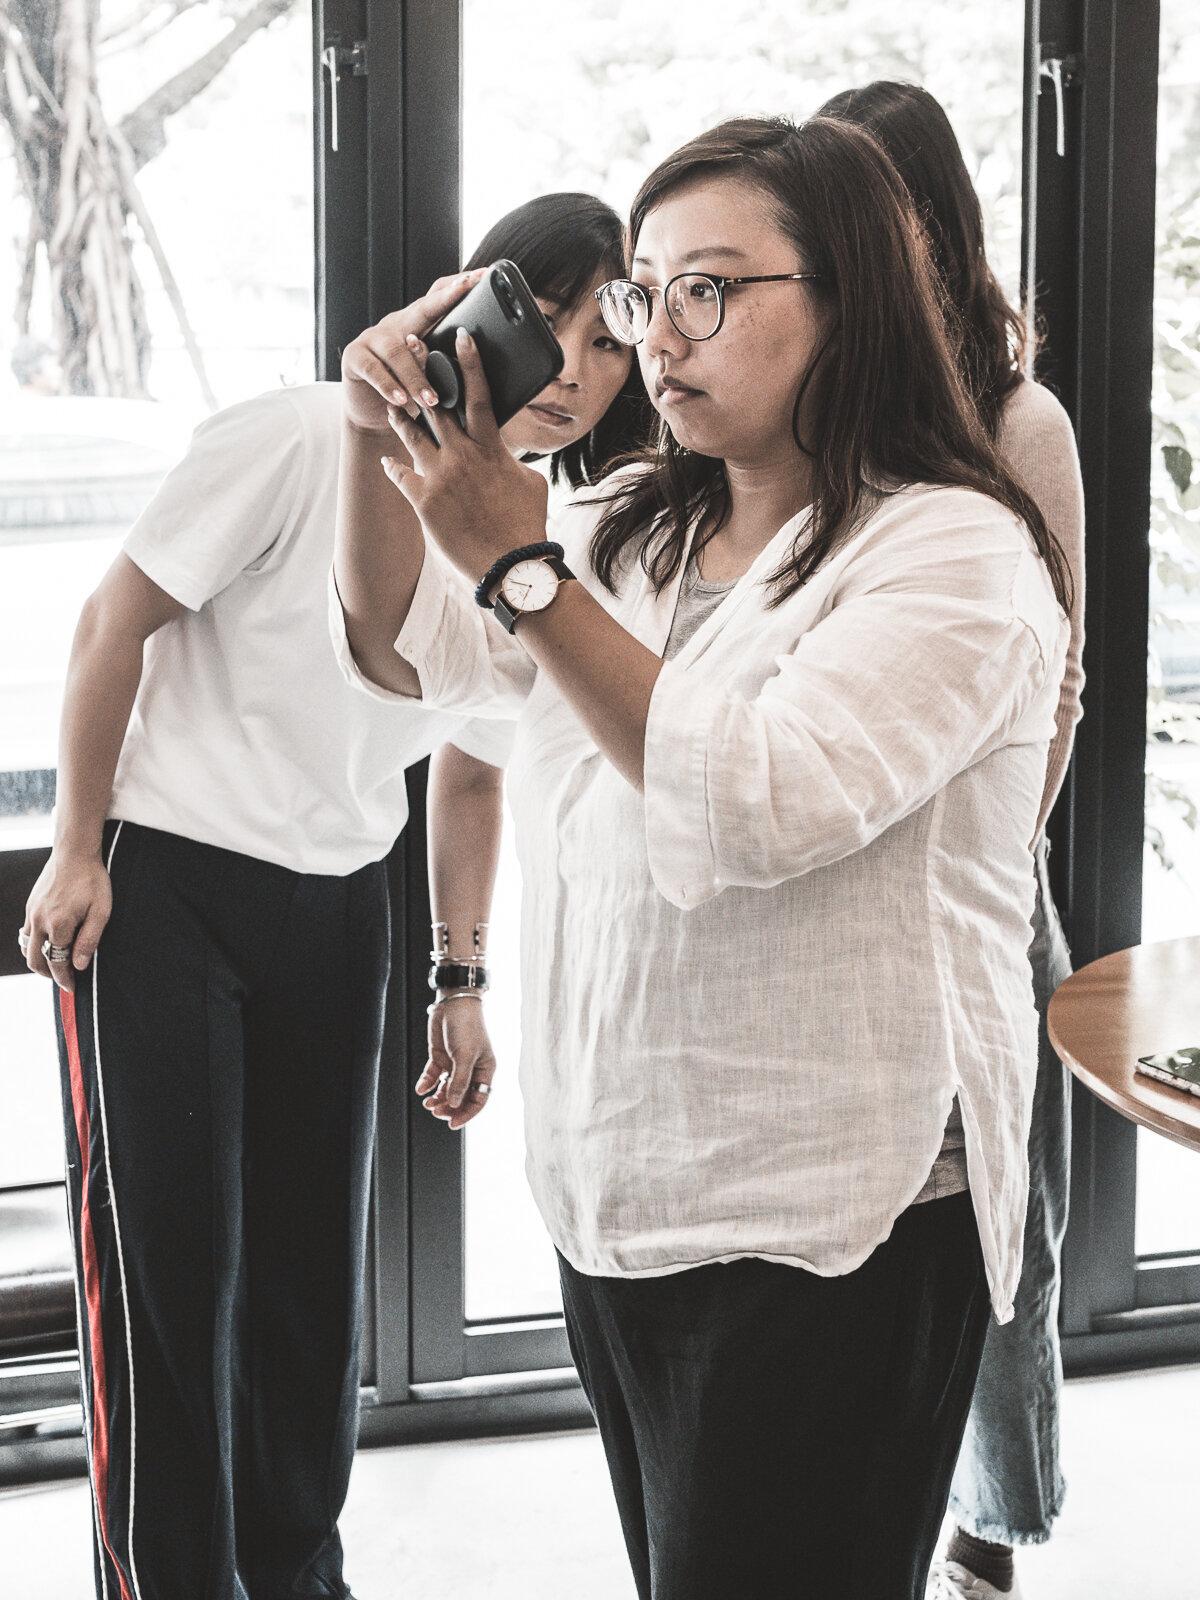 Charming Chat Photography Workshop - Olympus EM1 Markii 2512 - Yes! Please Enjoy by Fanning Tseng-24.jpg